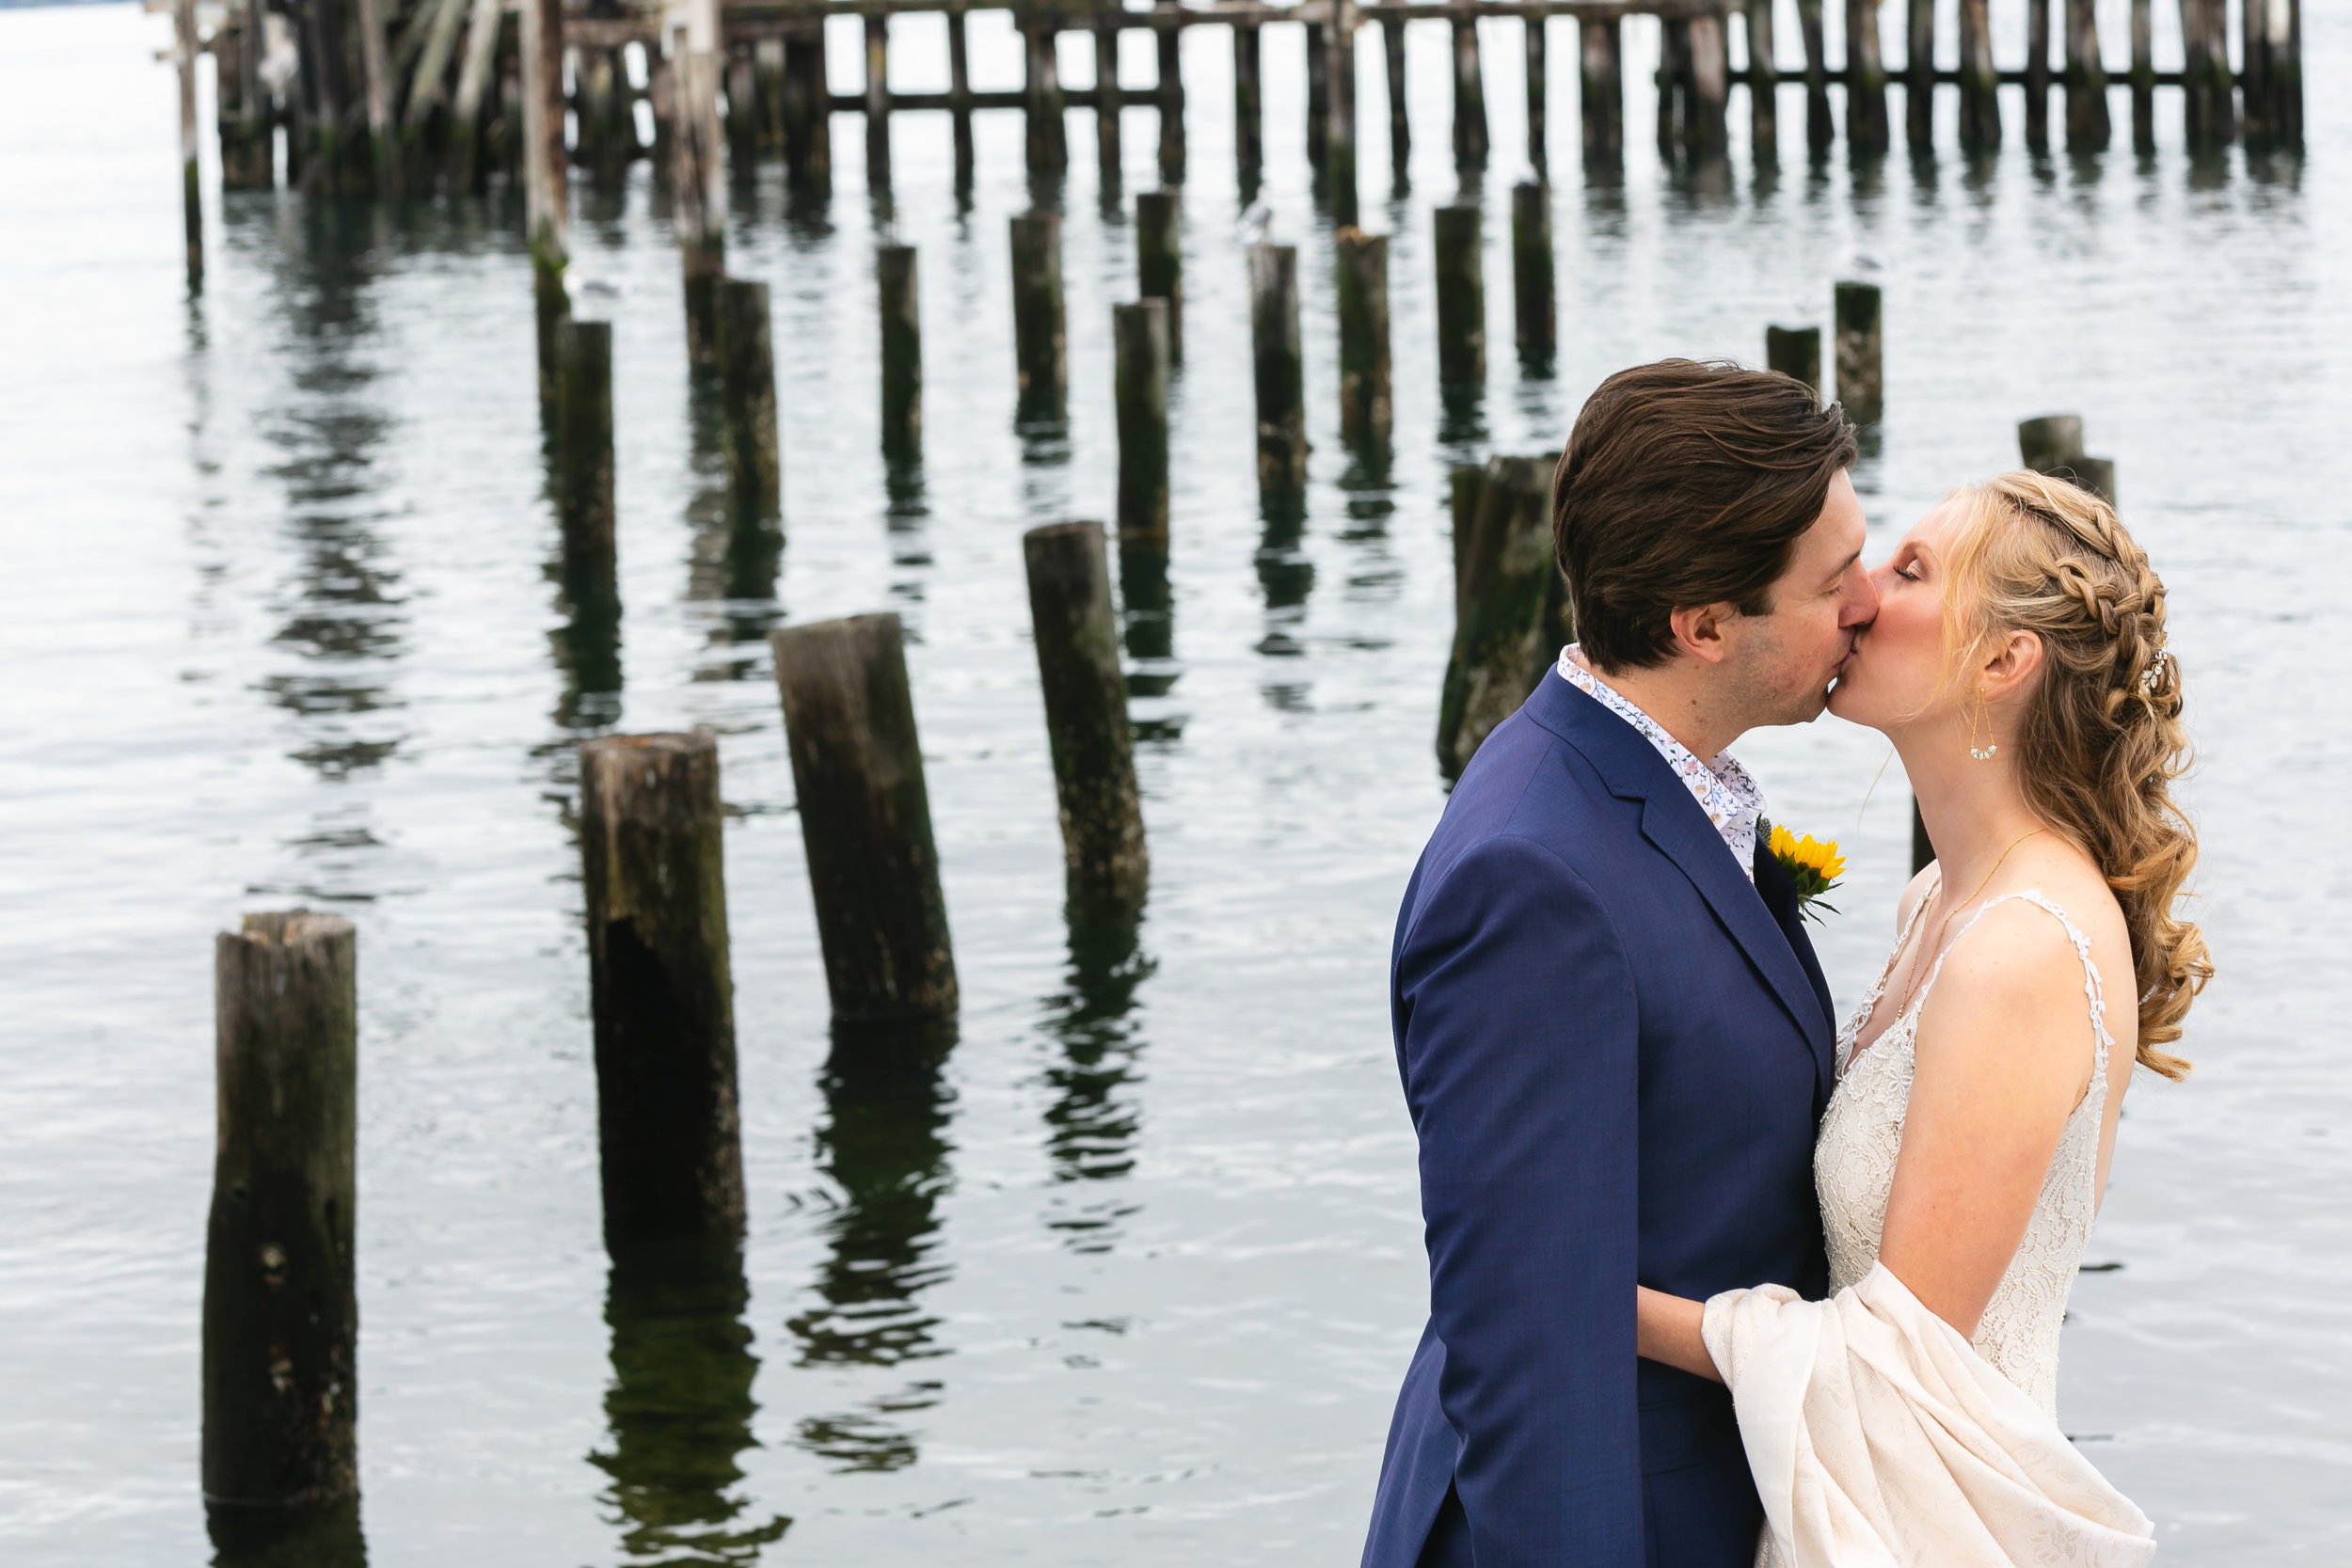 Gorski Wedding first look set-50.jpg